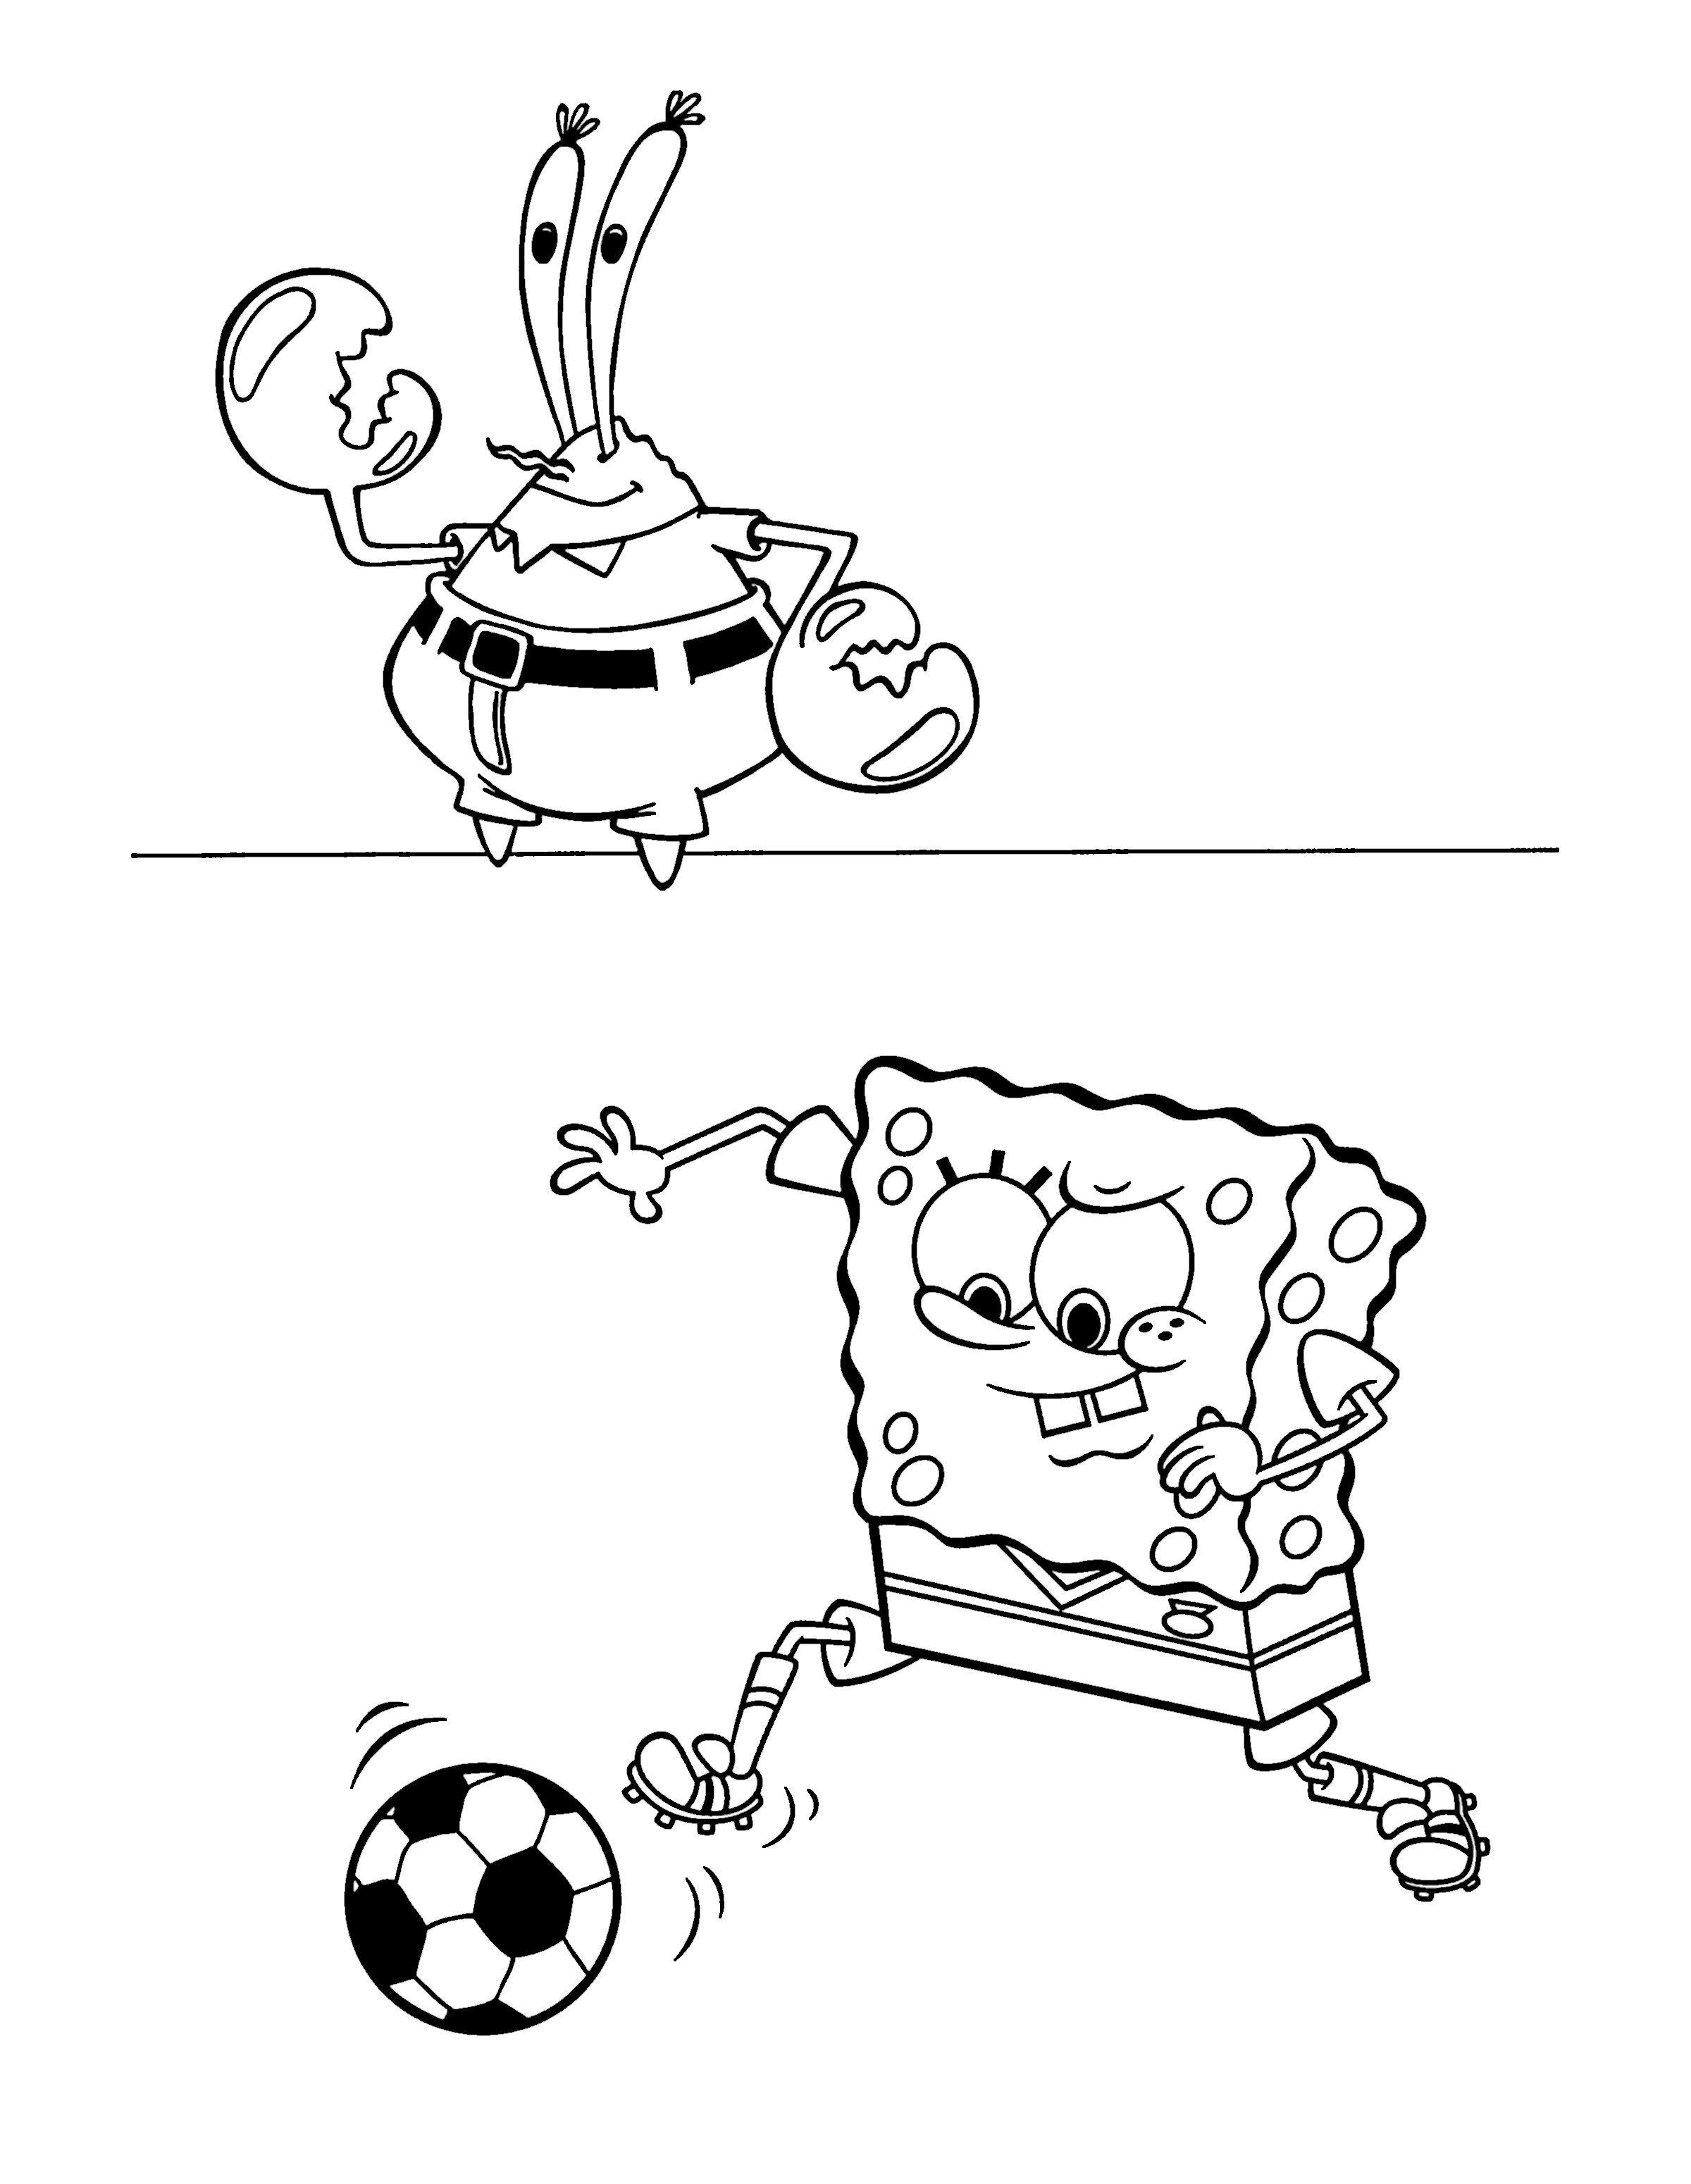 Dibujos para niños para imprimir Bob Esponja 69 | Dibujo | Pinterest ...